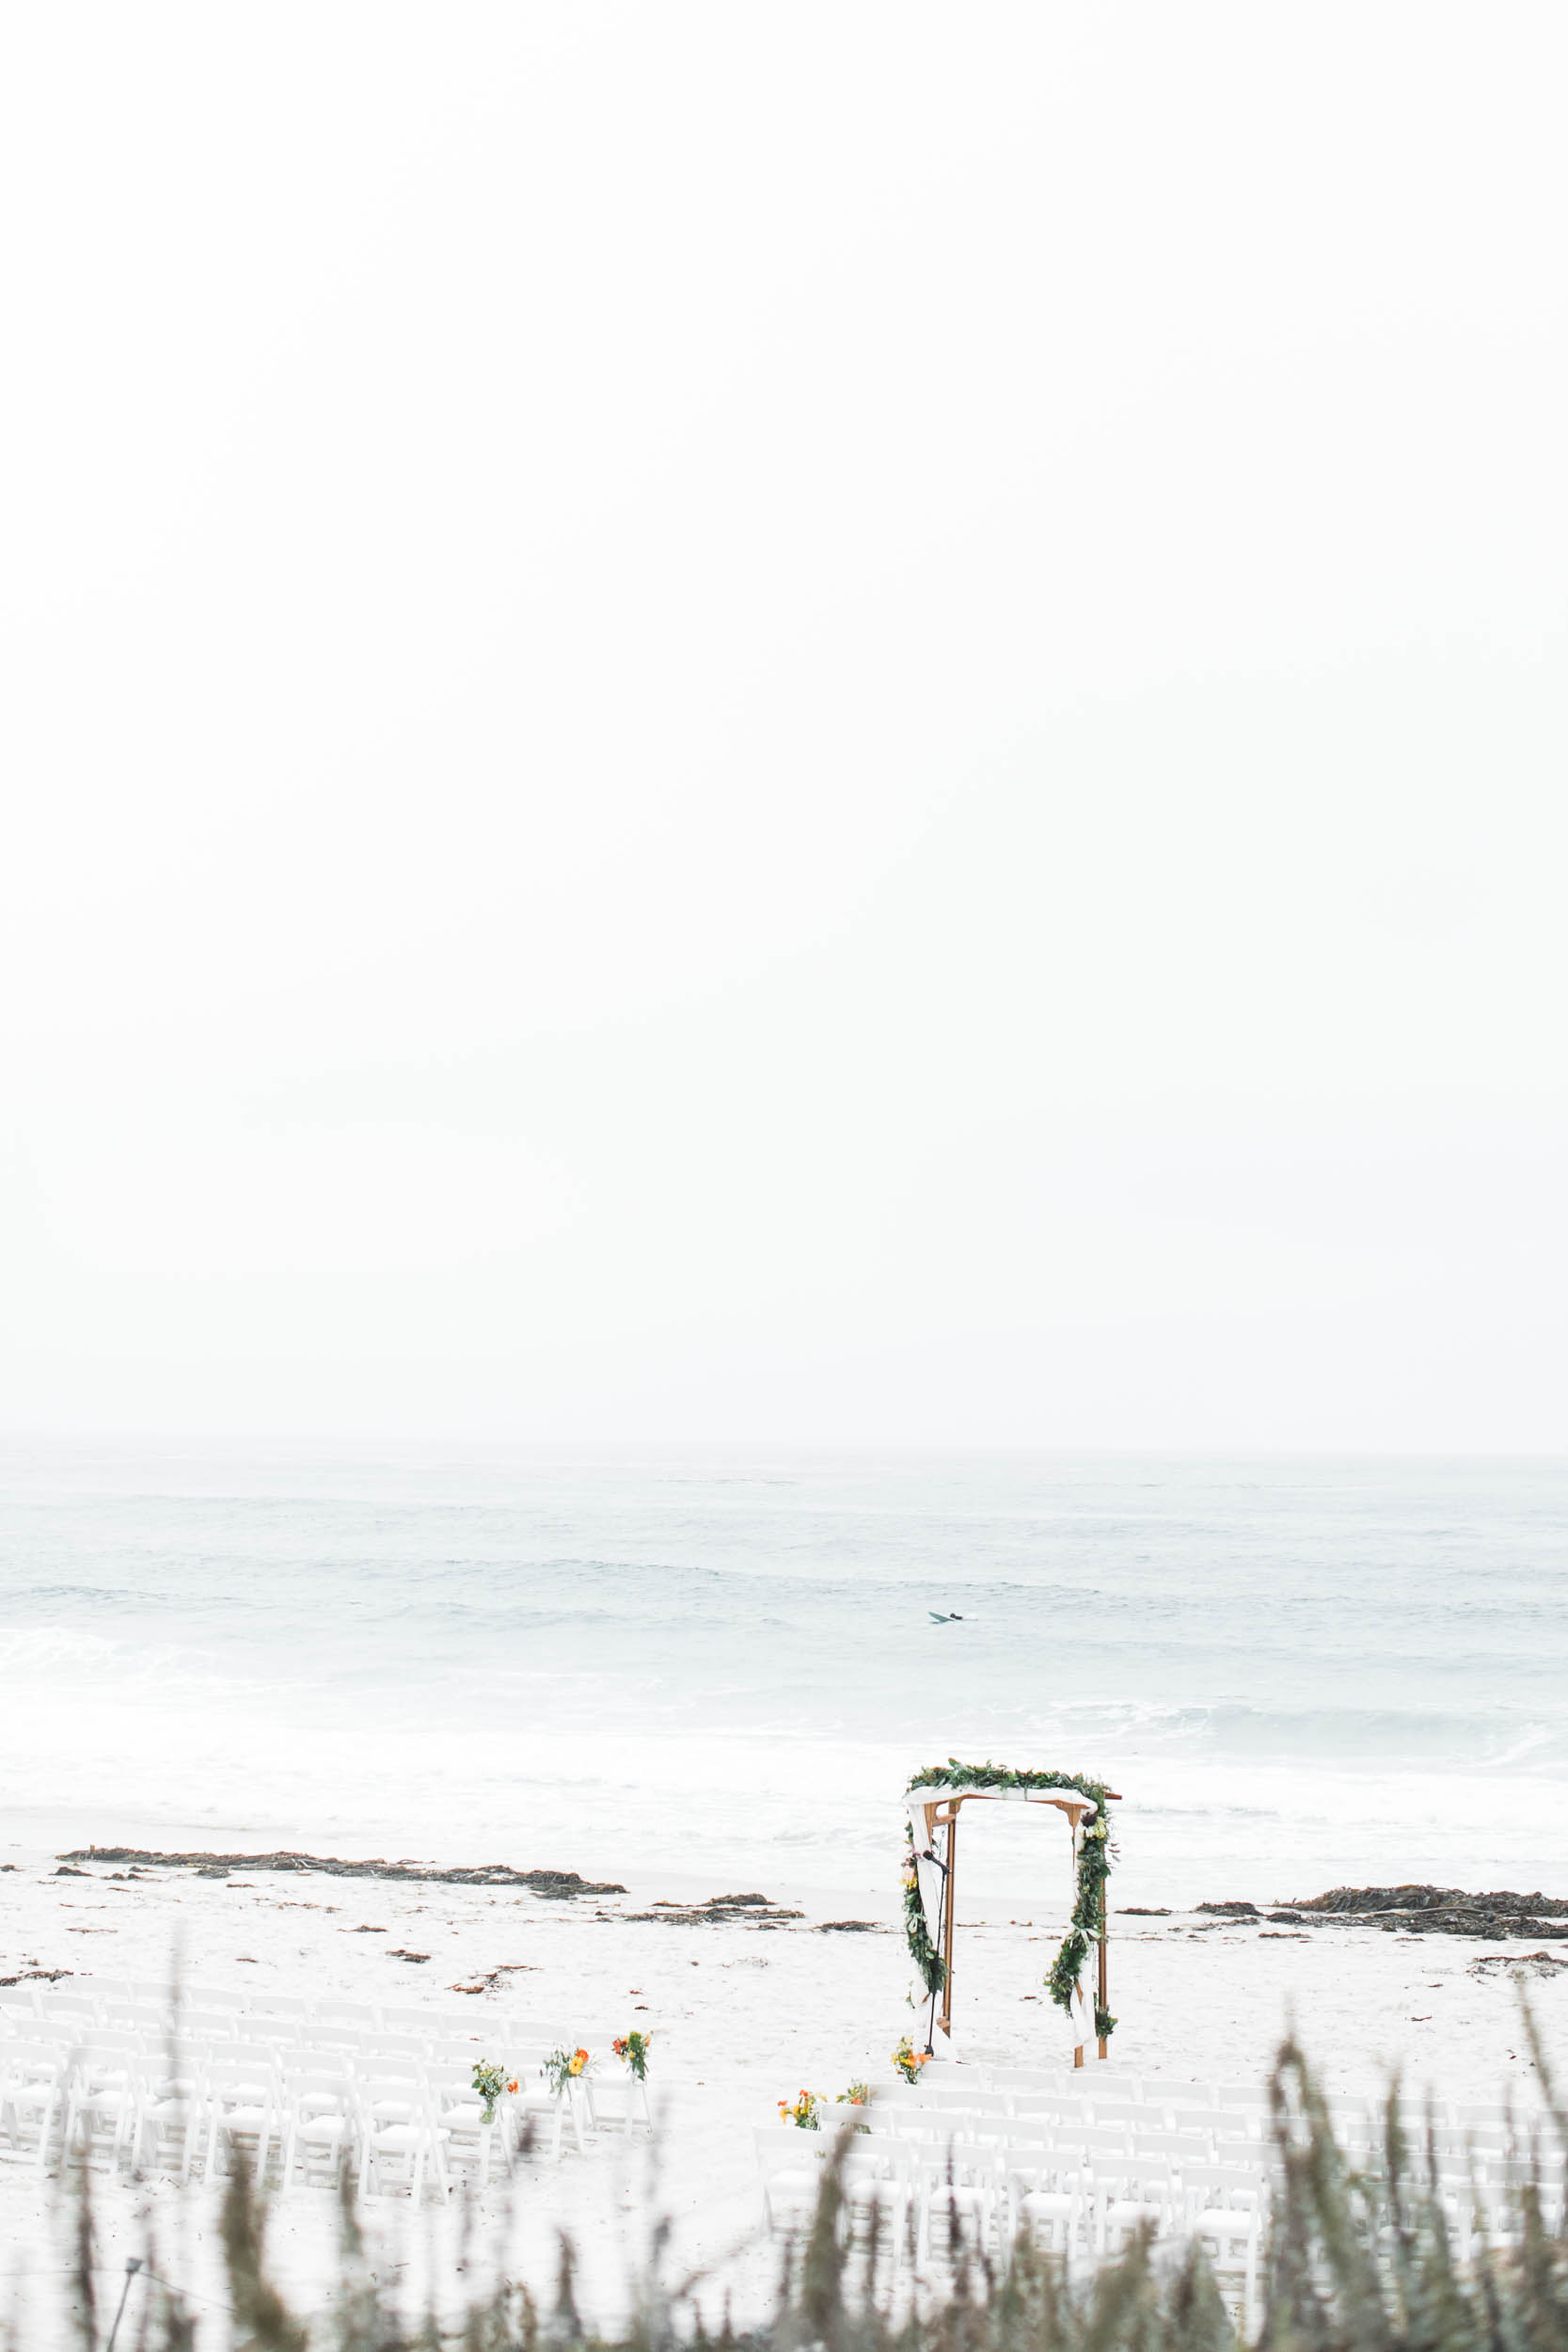 082617_C+K_Asilomar Pacific Grove Wedding_Buena Lane Photography_2293ER.jpg